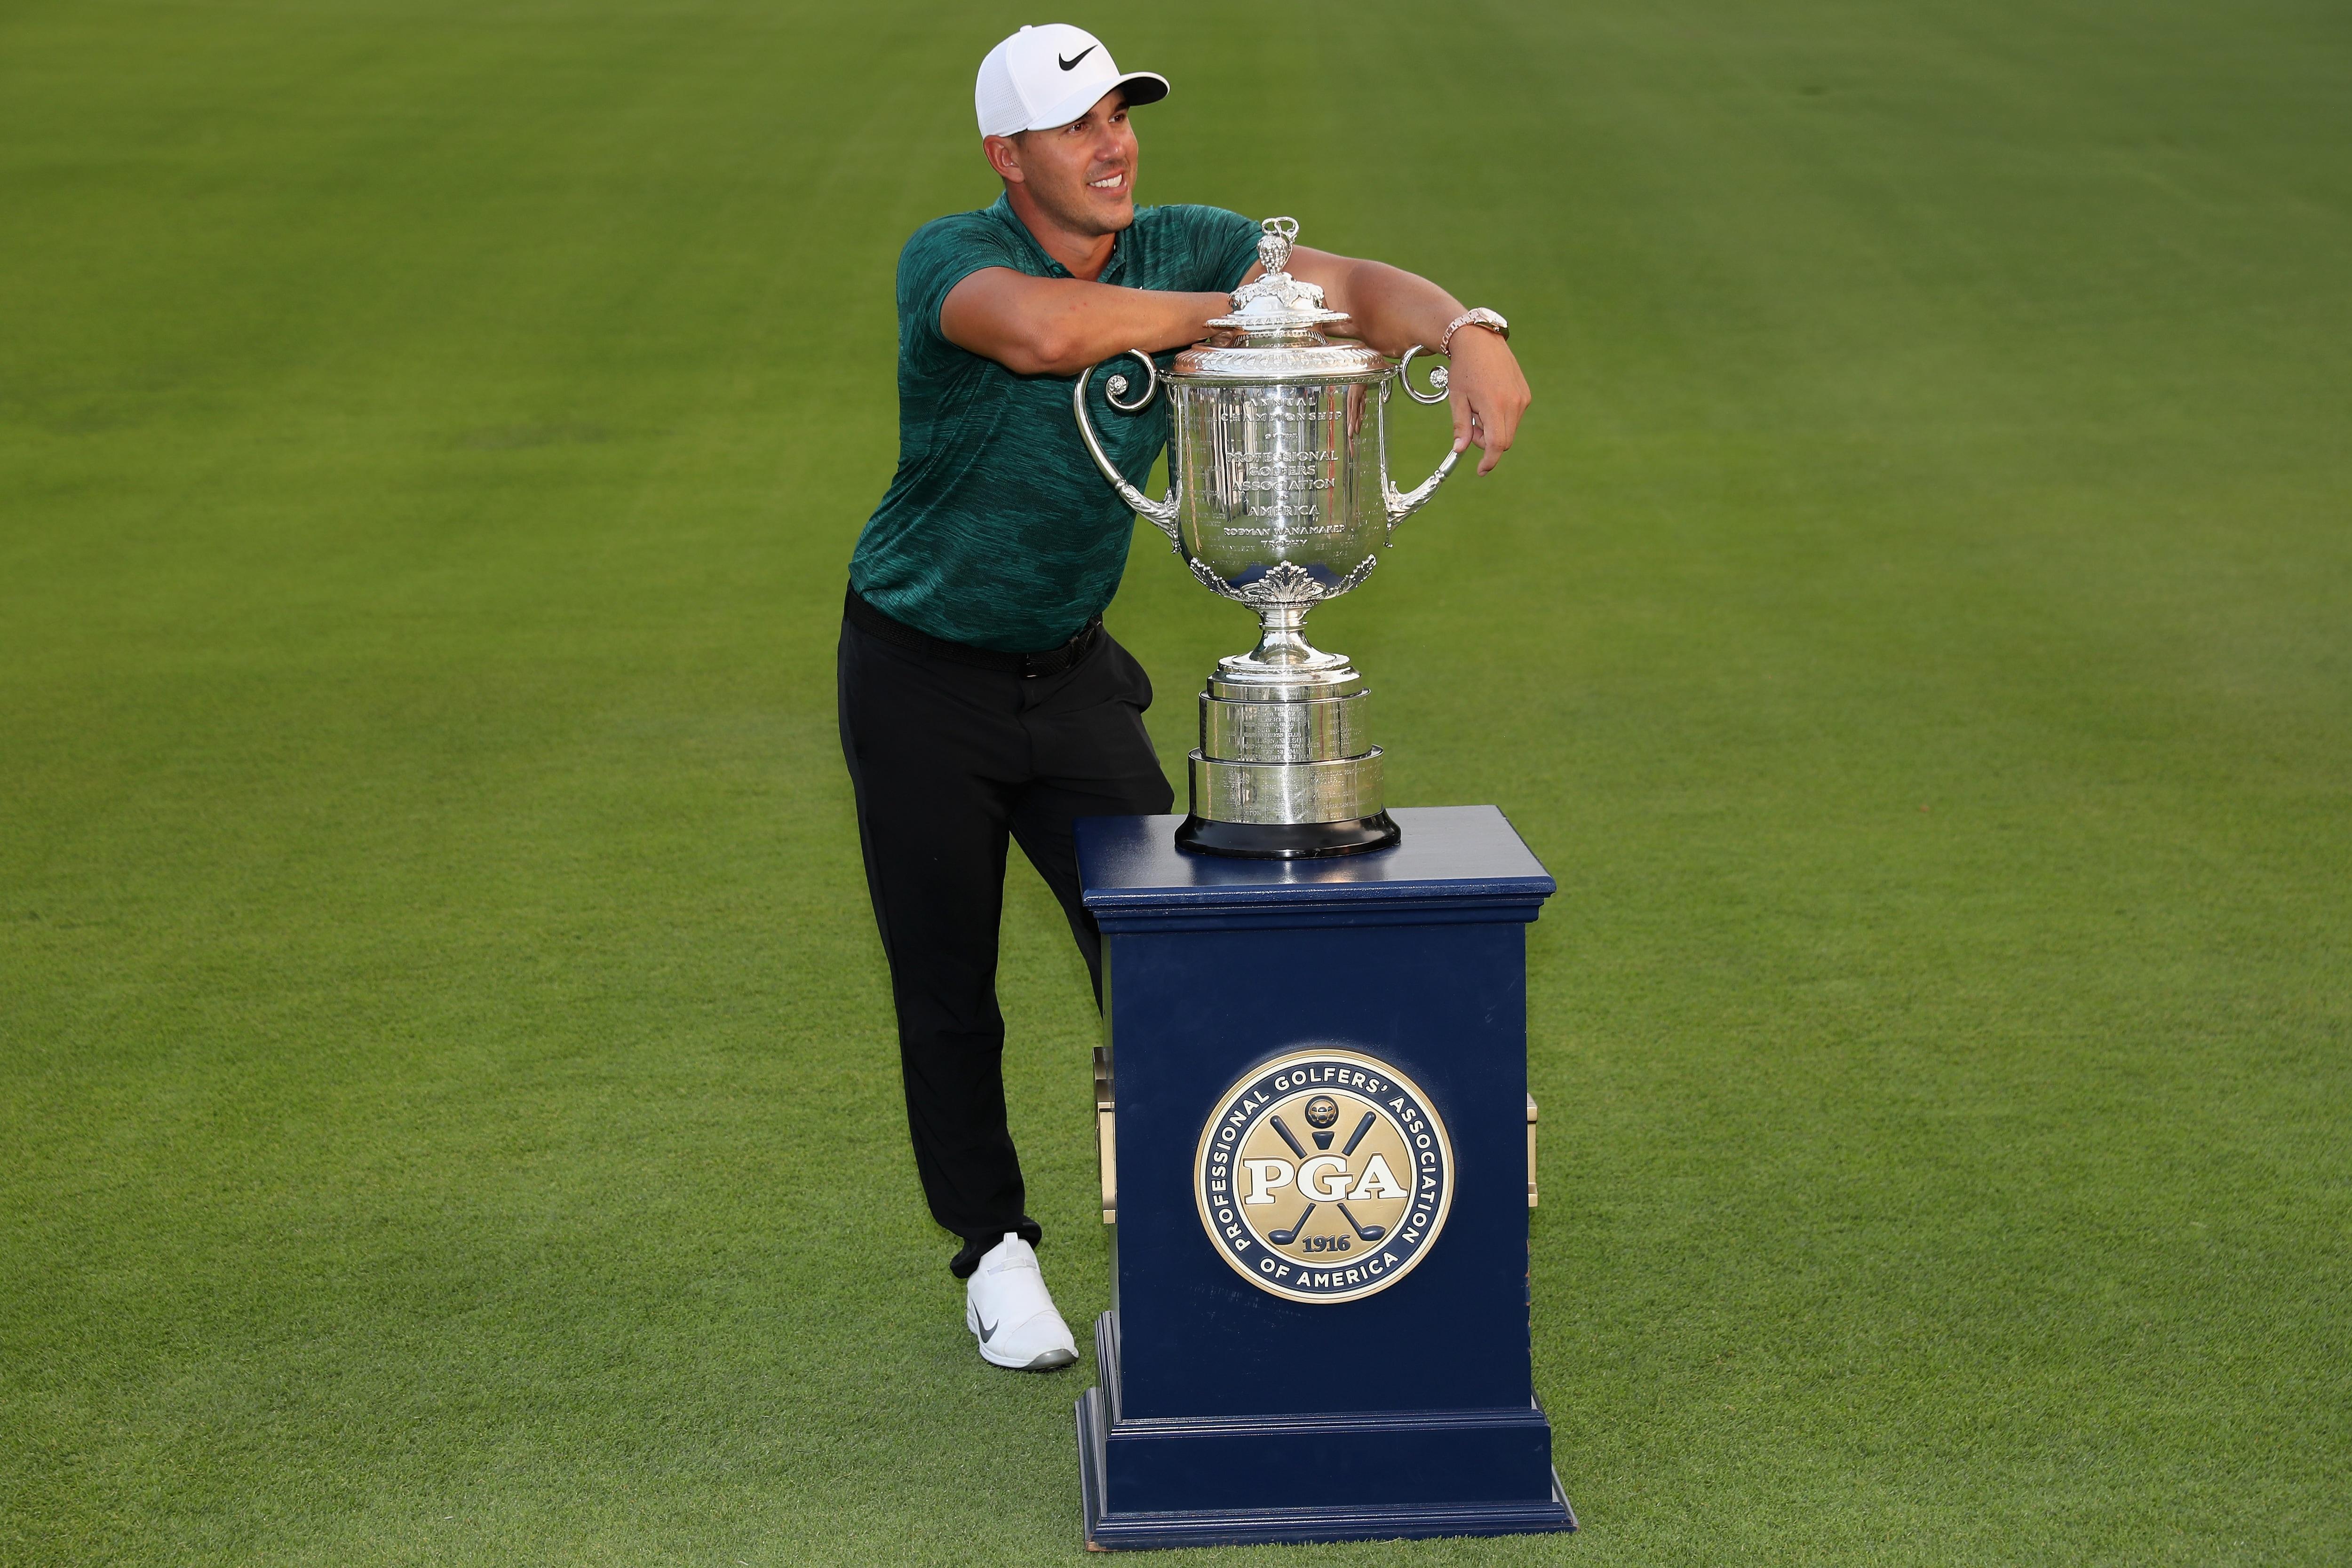 Brooks Koepka at the 2018 PGA Championship